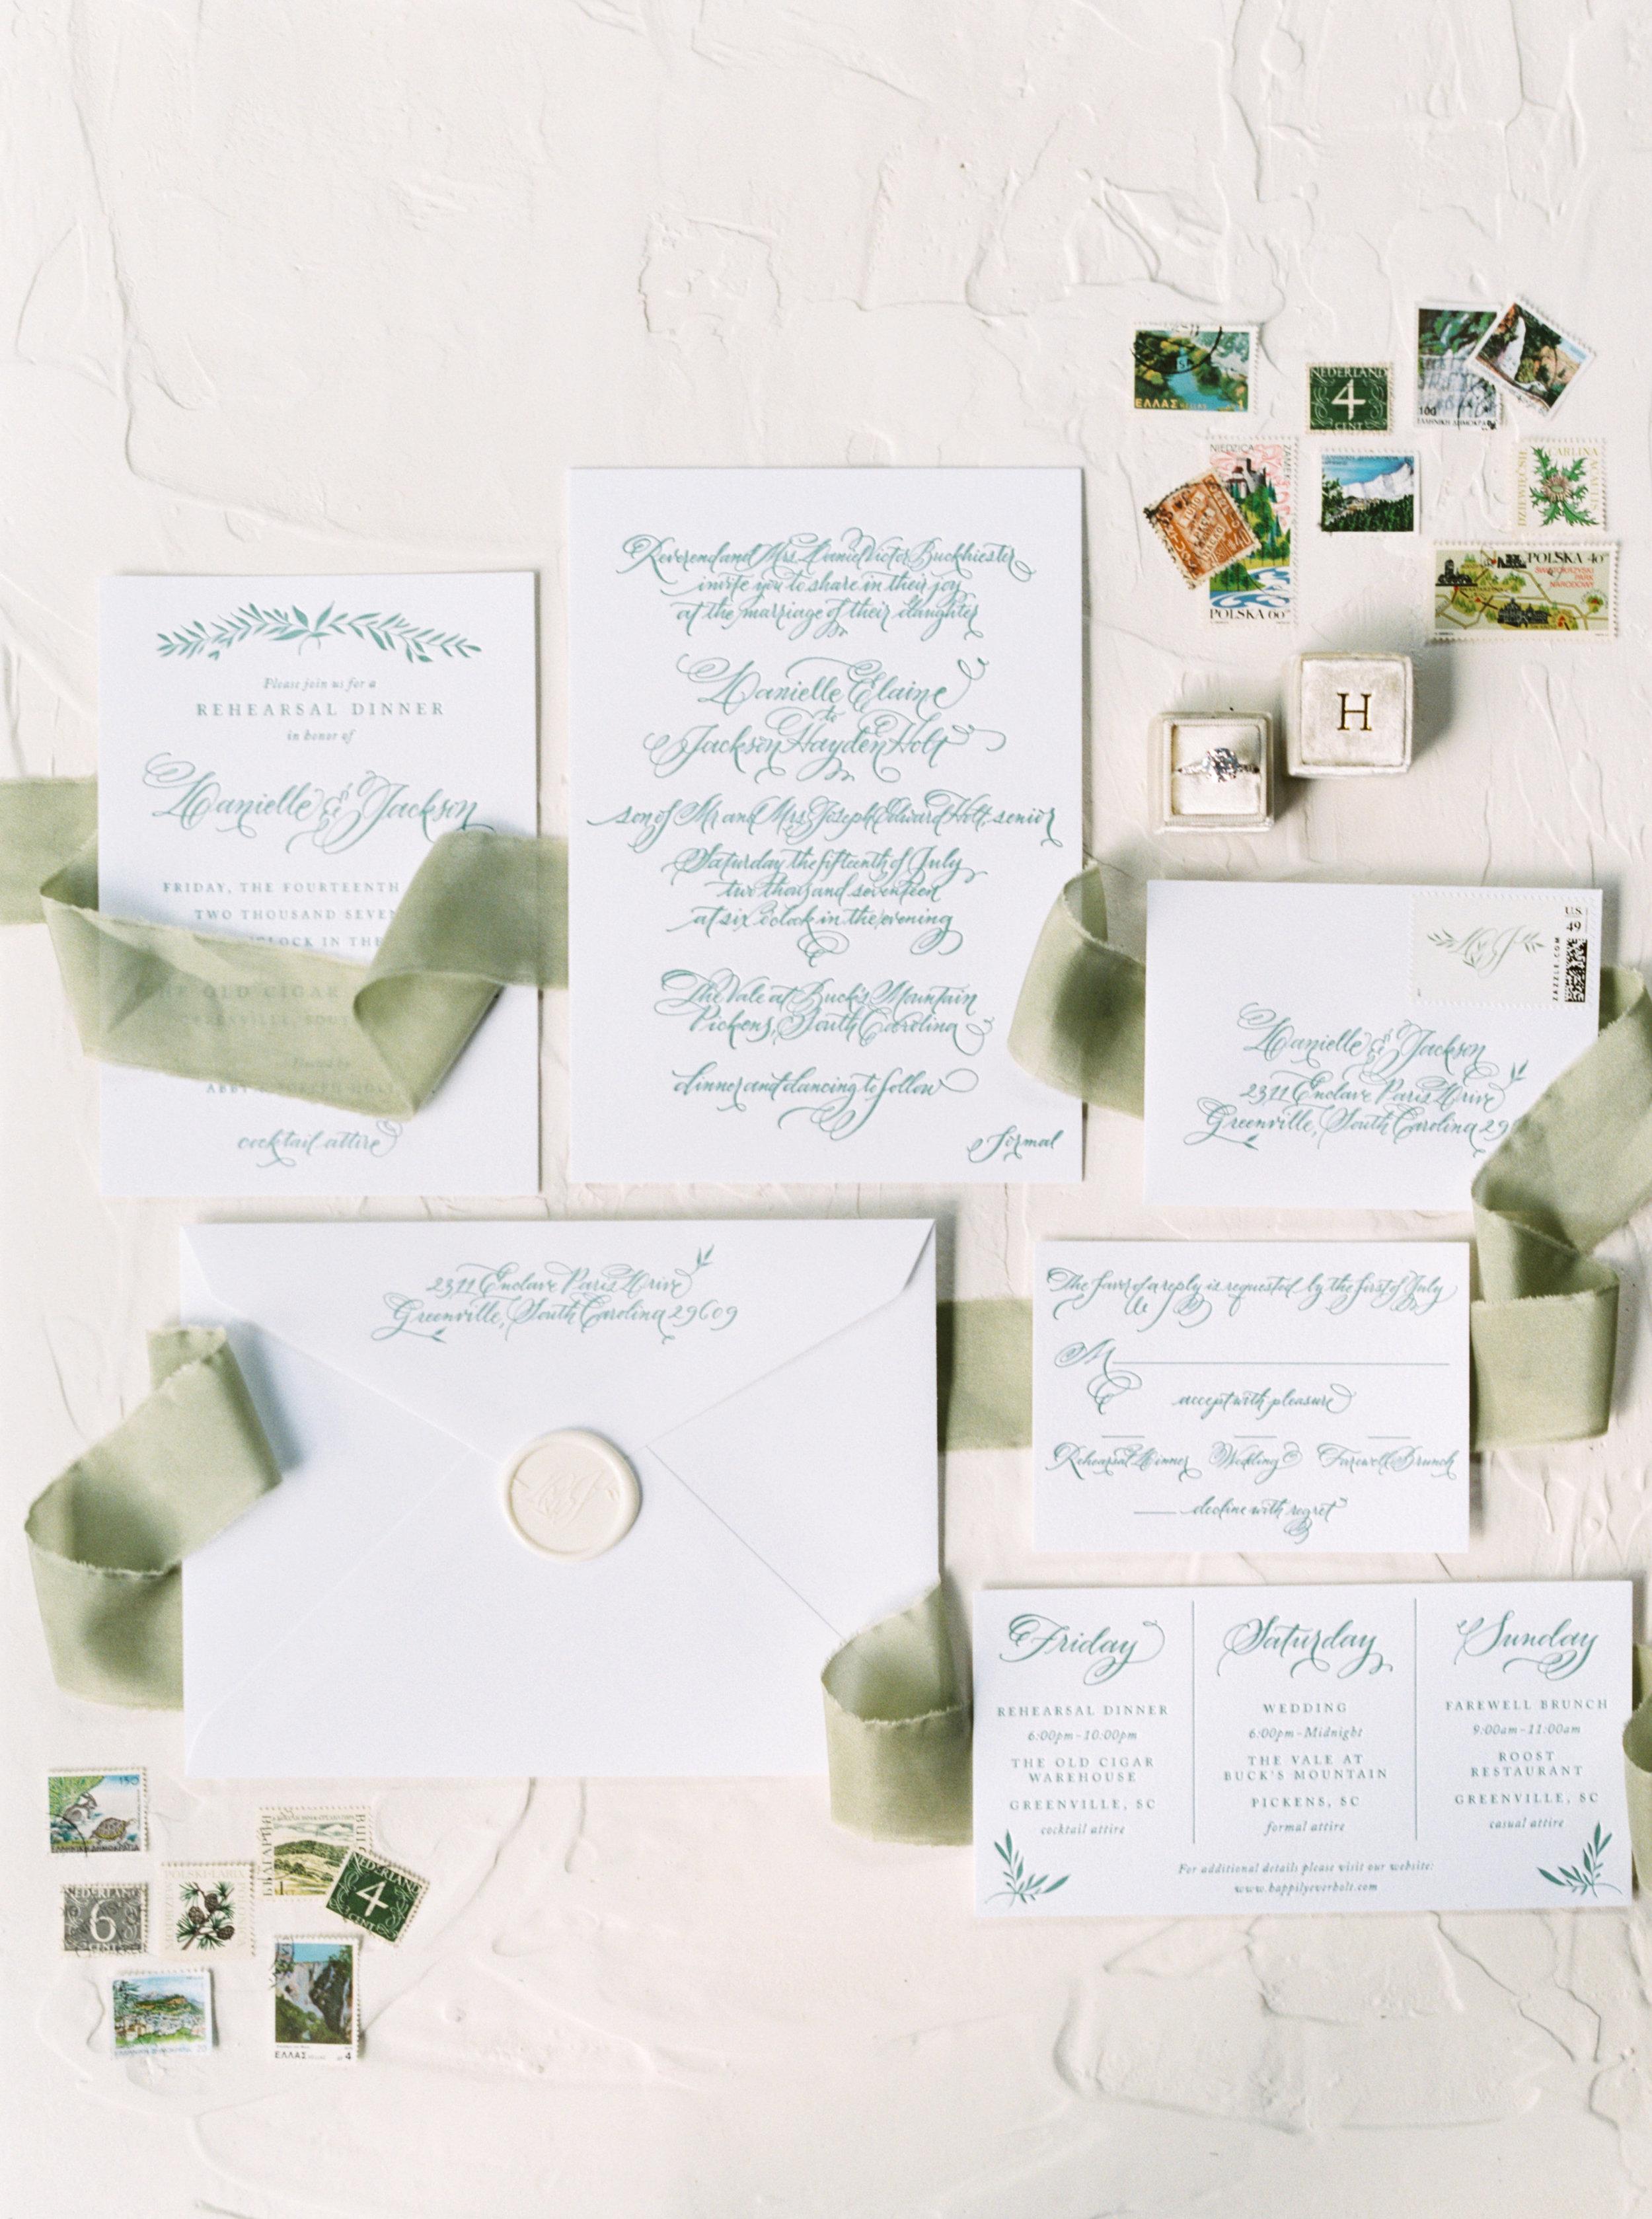 candicelorraine-styling-creativedirector-chapterseries-lost-unearthingtc-24.jpg